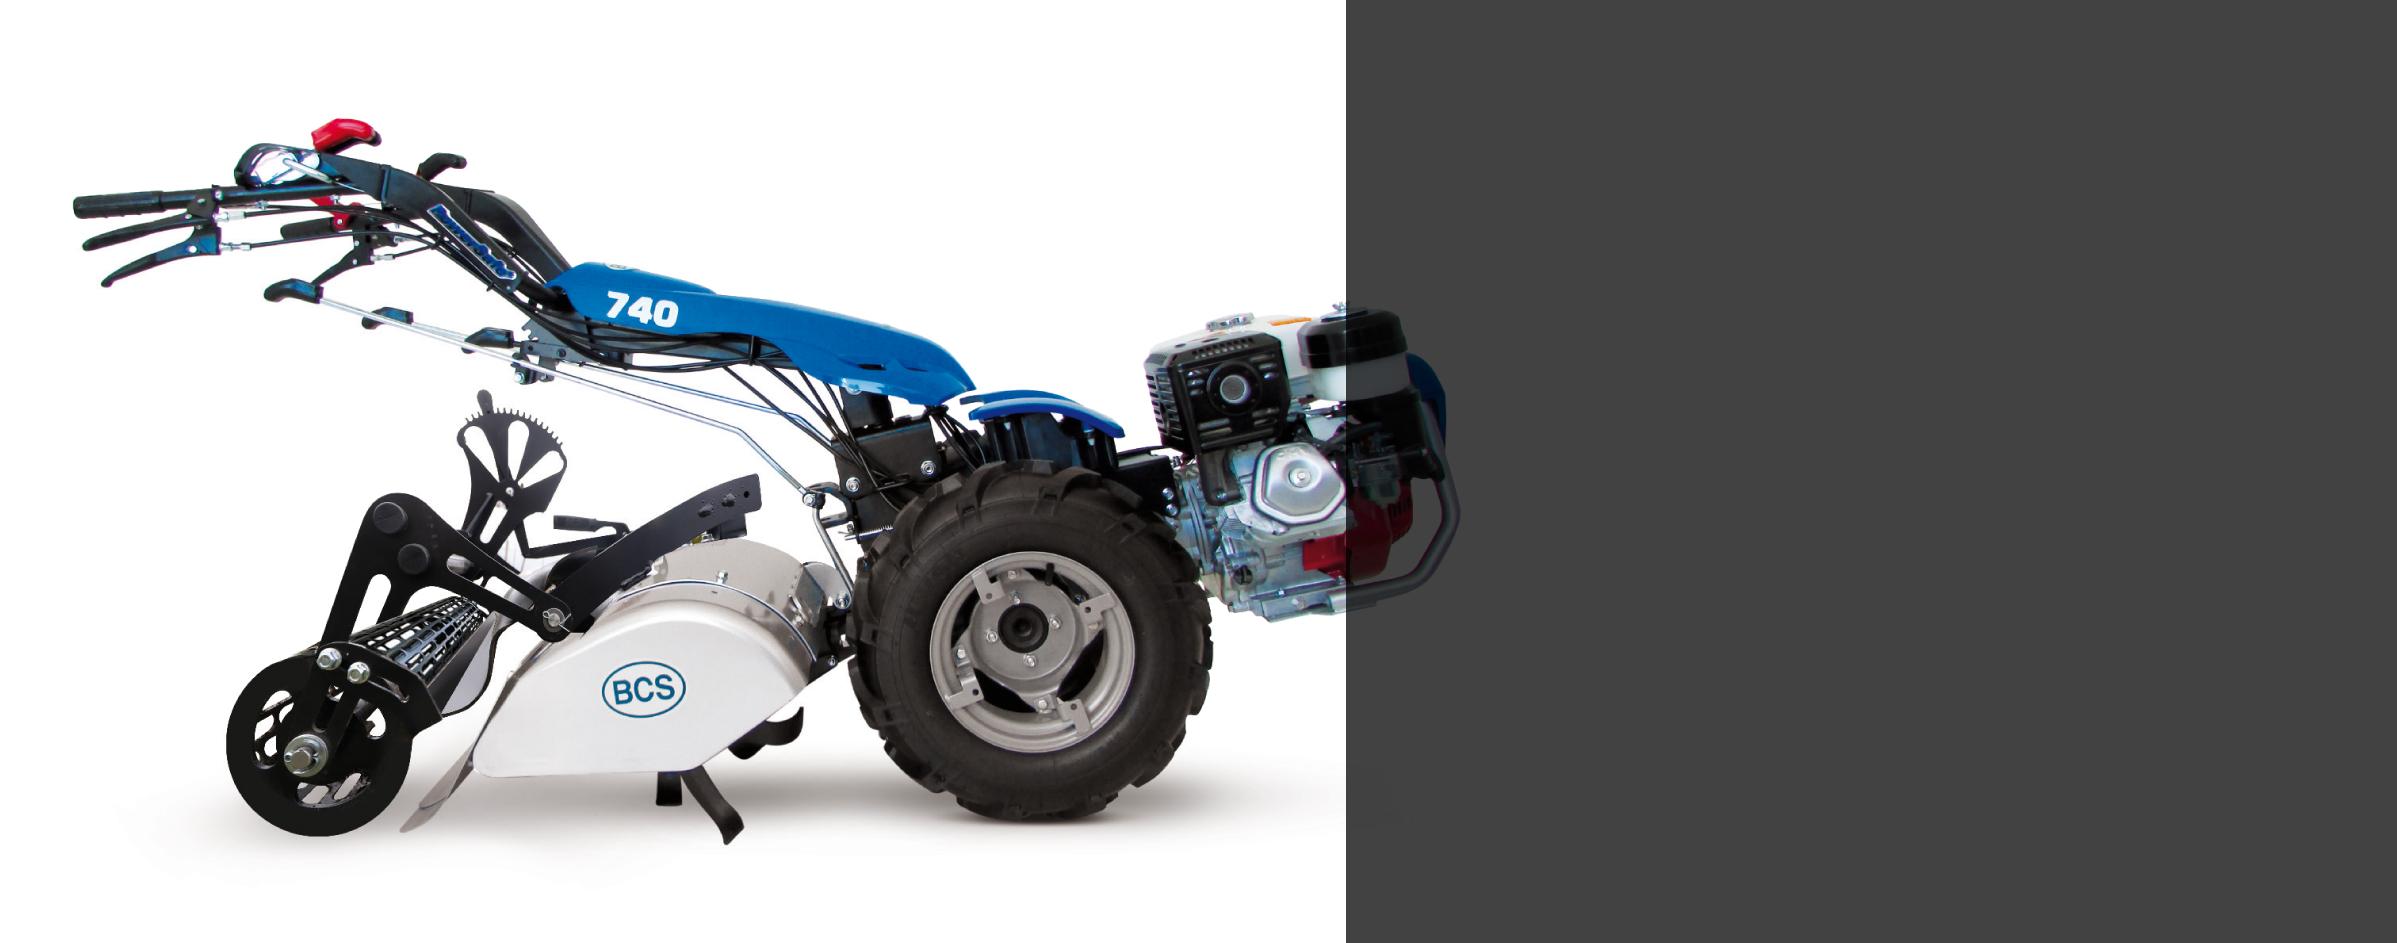 MOTOCULTOR 740 Gasolina / arranque eléctrico + rodillo nivelador PDR